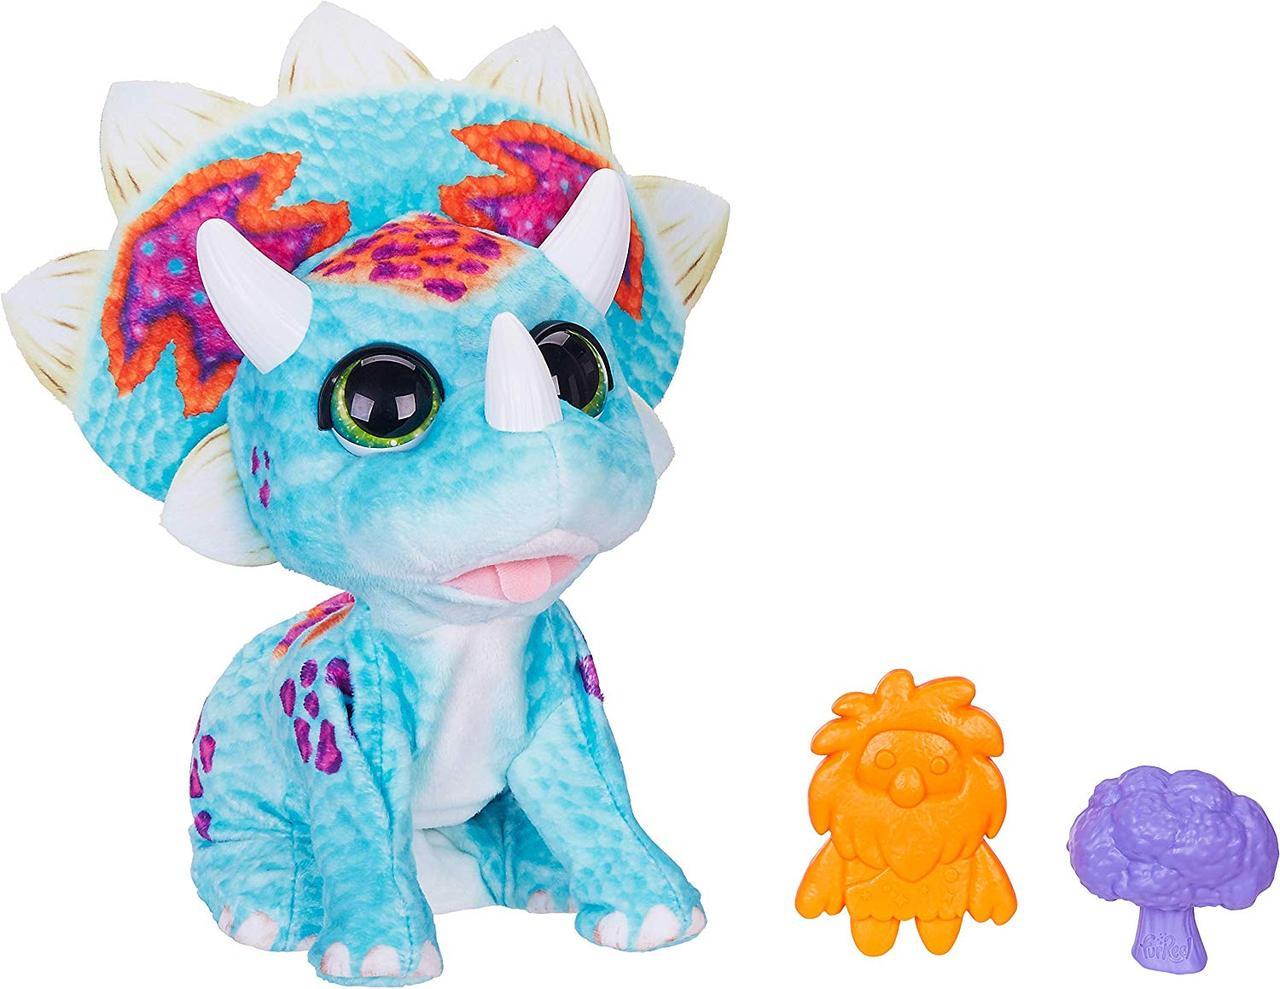 Динозавр малыш Дино Топпер FurReal Friends Hoppin Topper Hasbro